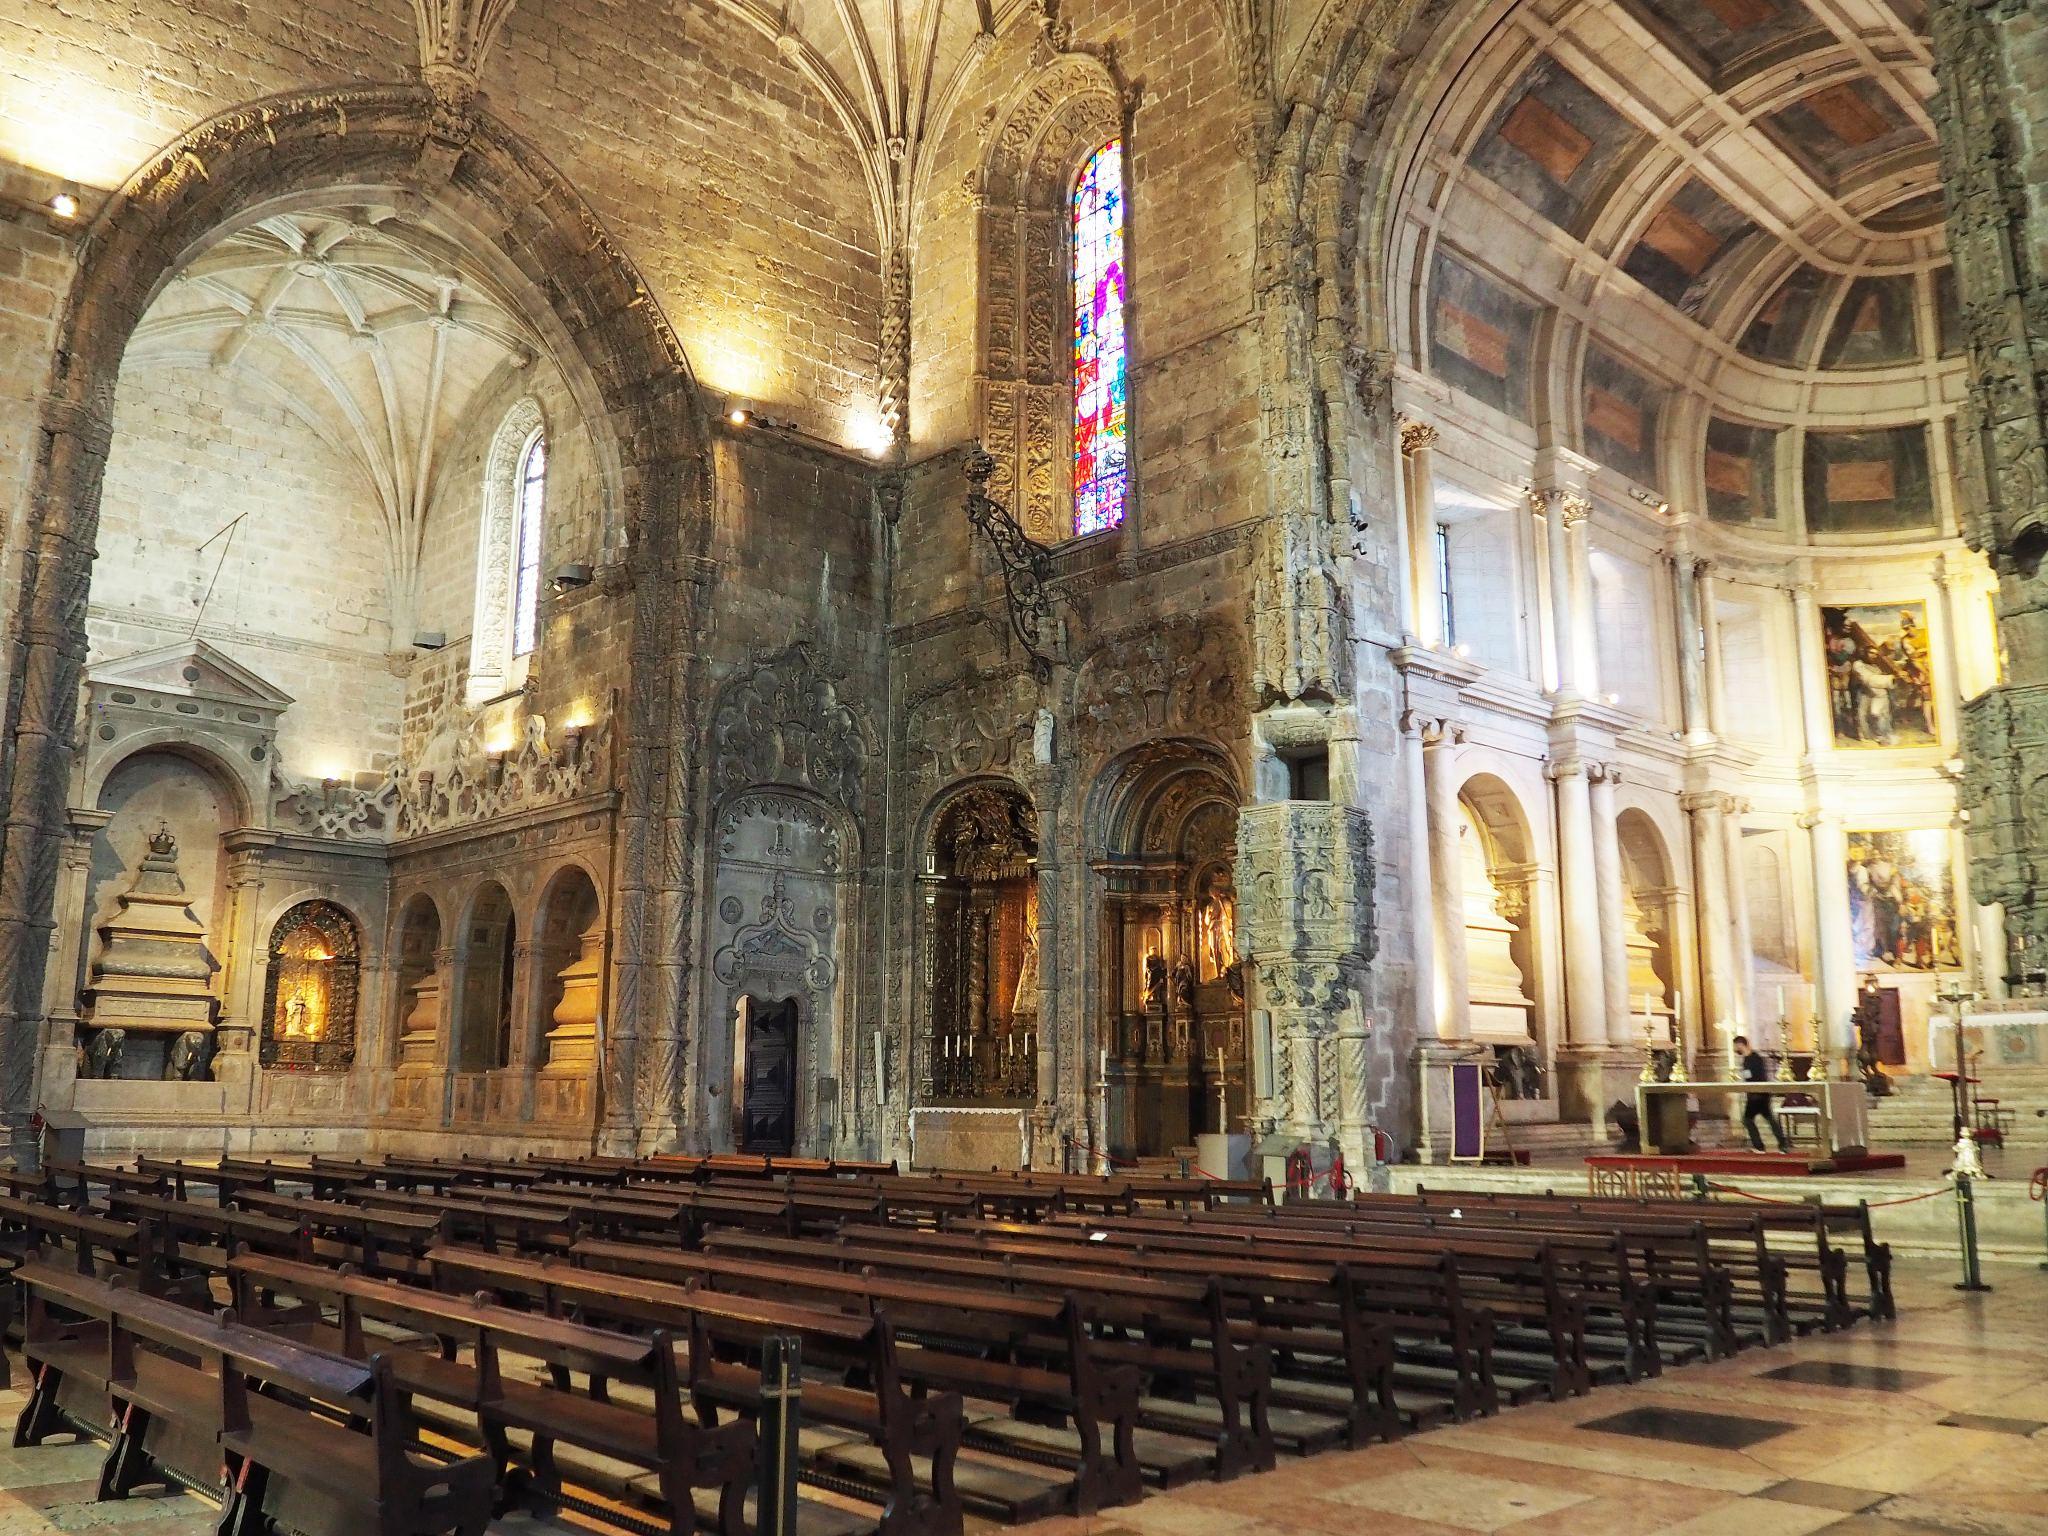 Mosteiro dos Jerónimos - Belém